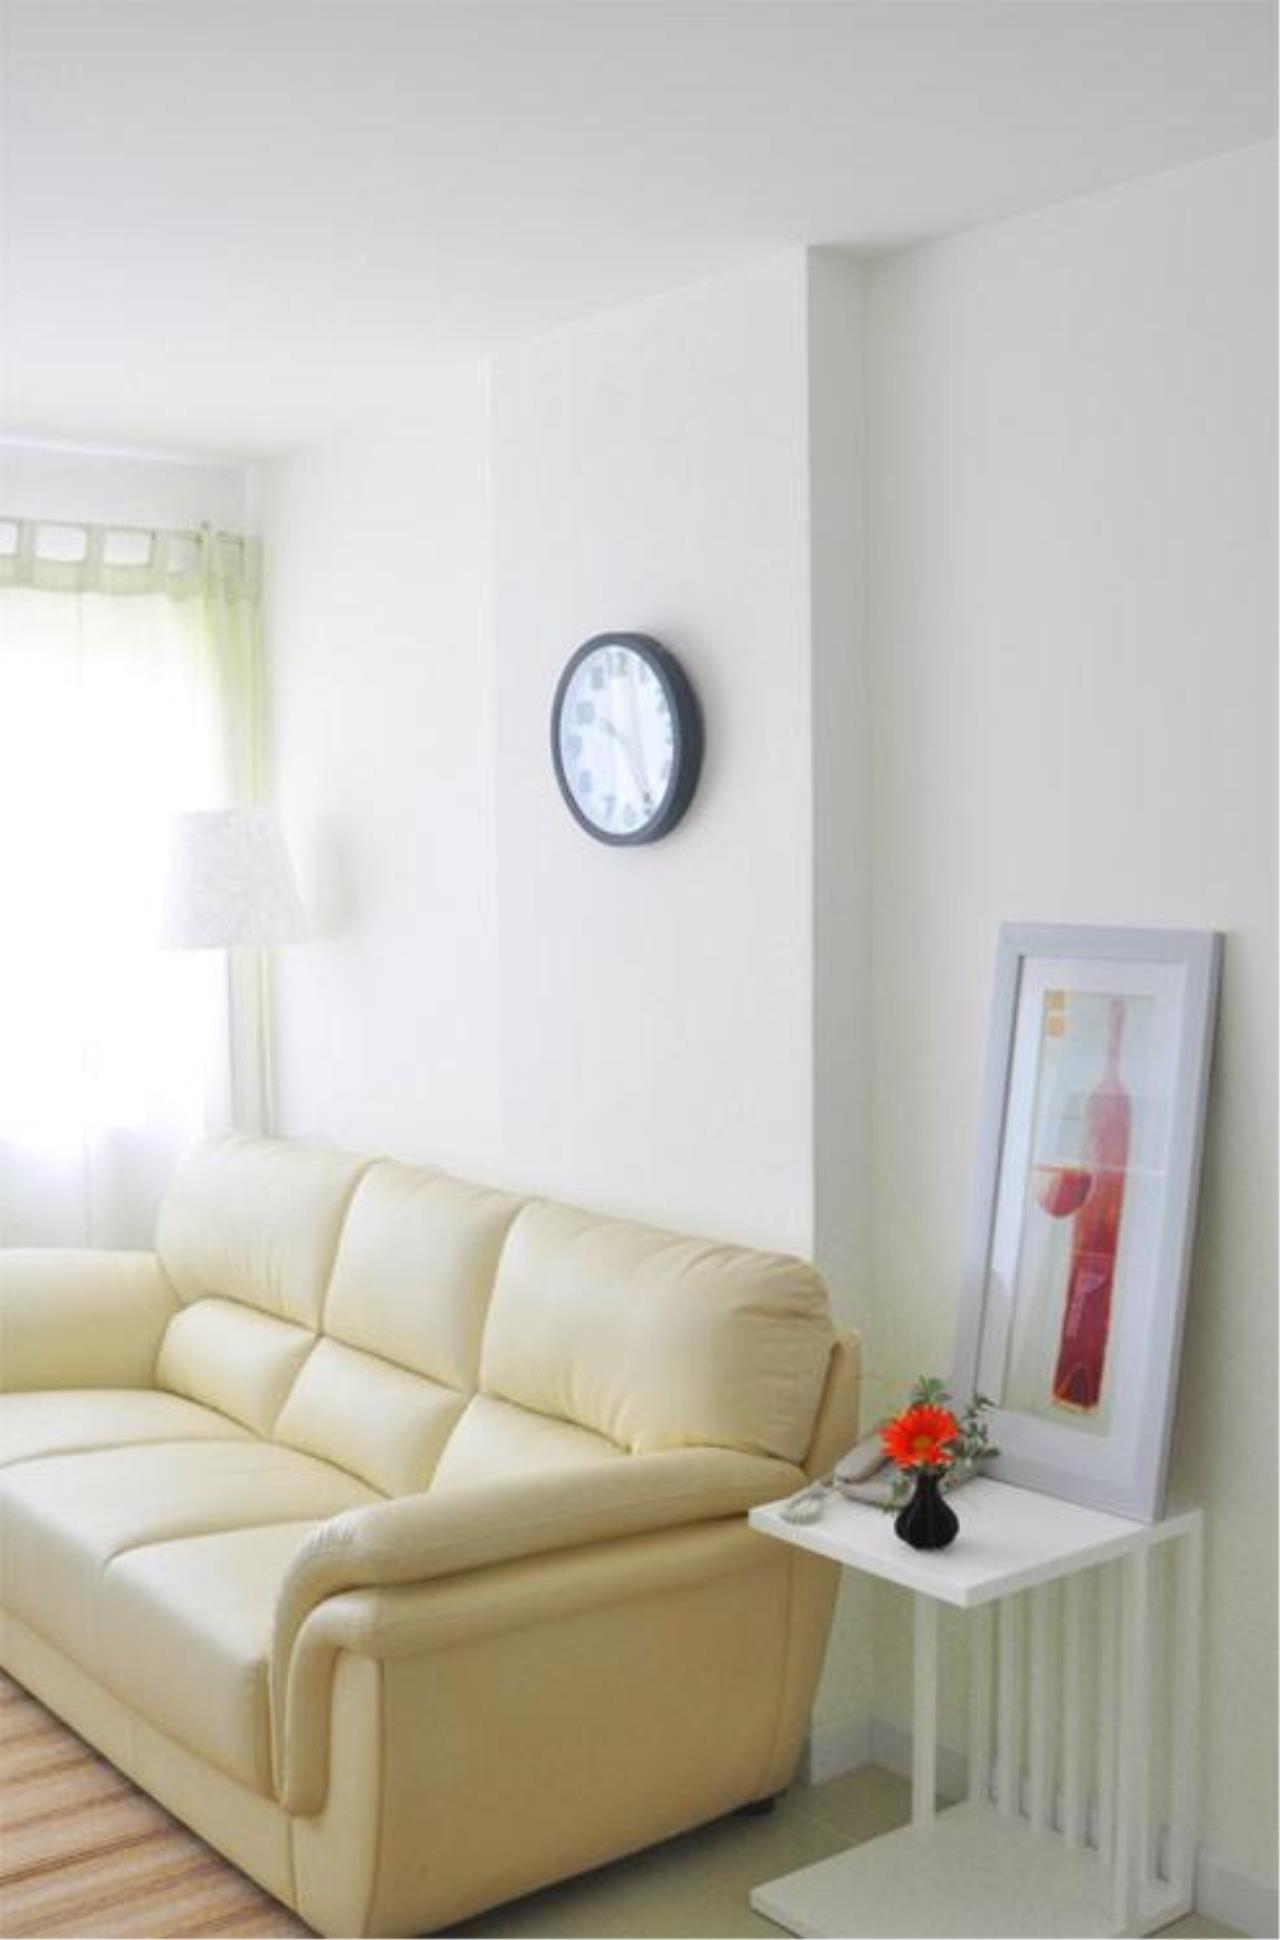 Piri Property Agency's one bedroom  For Rent Condo One - Sukhumvit 67 5